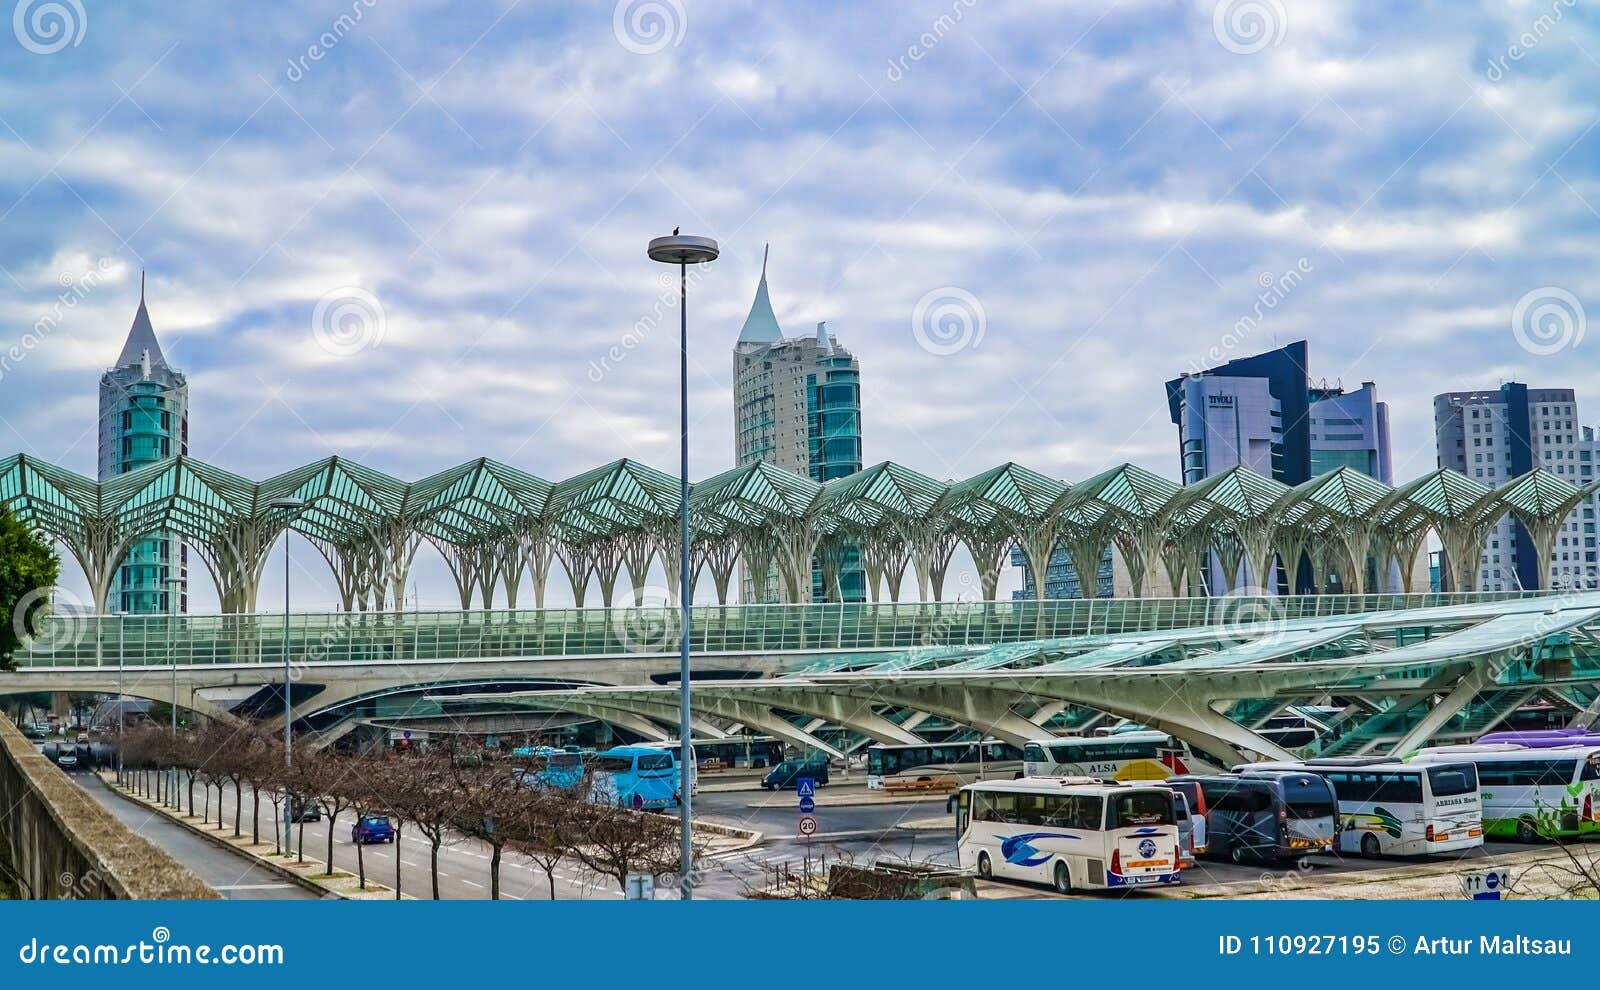 lissabon portugal dezember 30 2017 moderne architektur an der oriente station durch. Black Bedroom Furniture Sets. Home Design Ideas